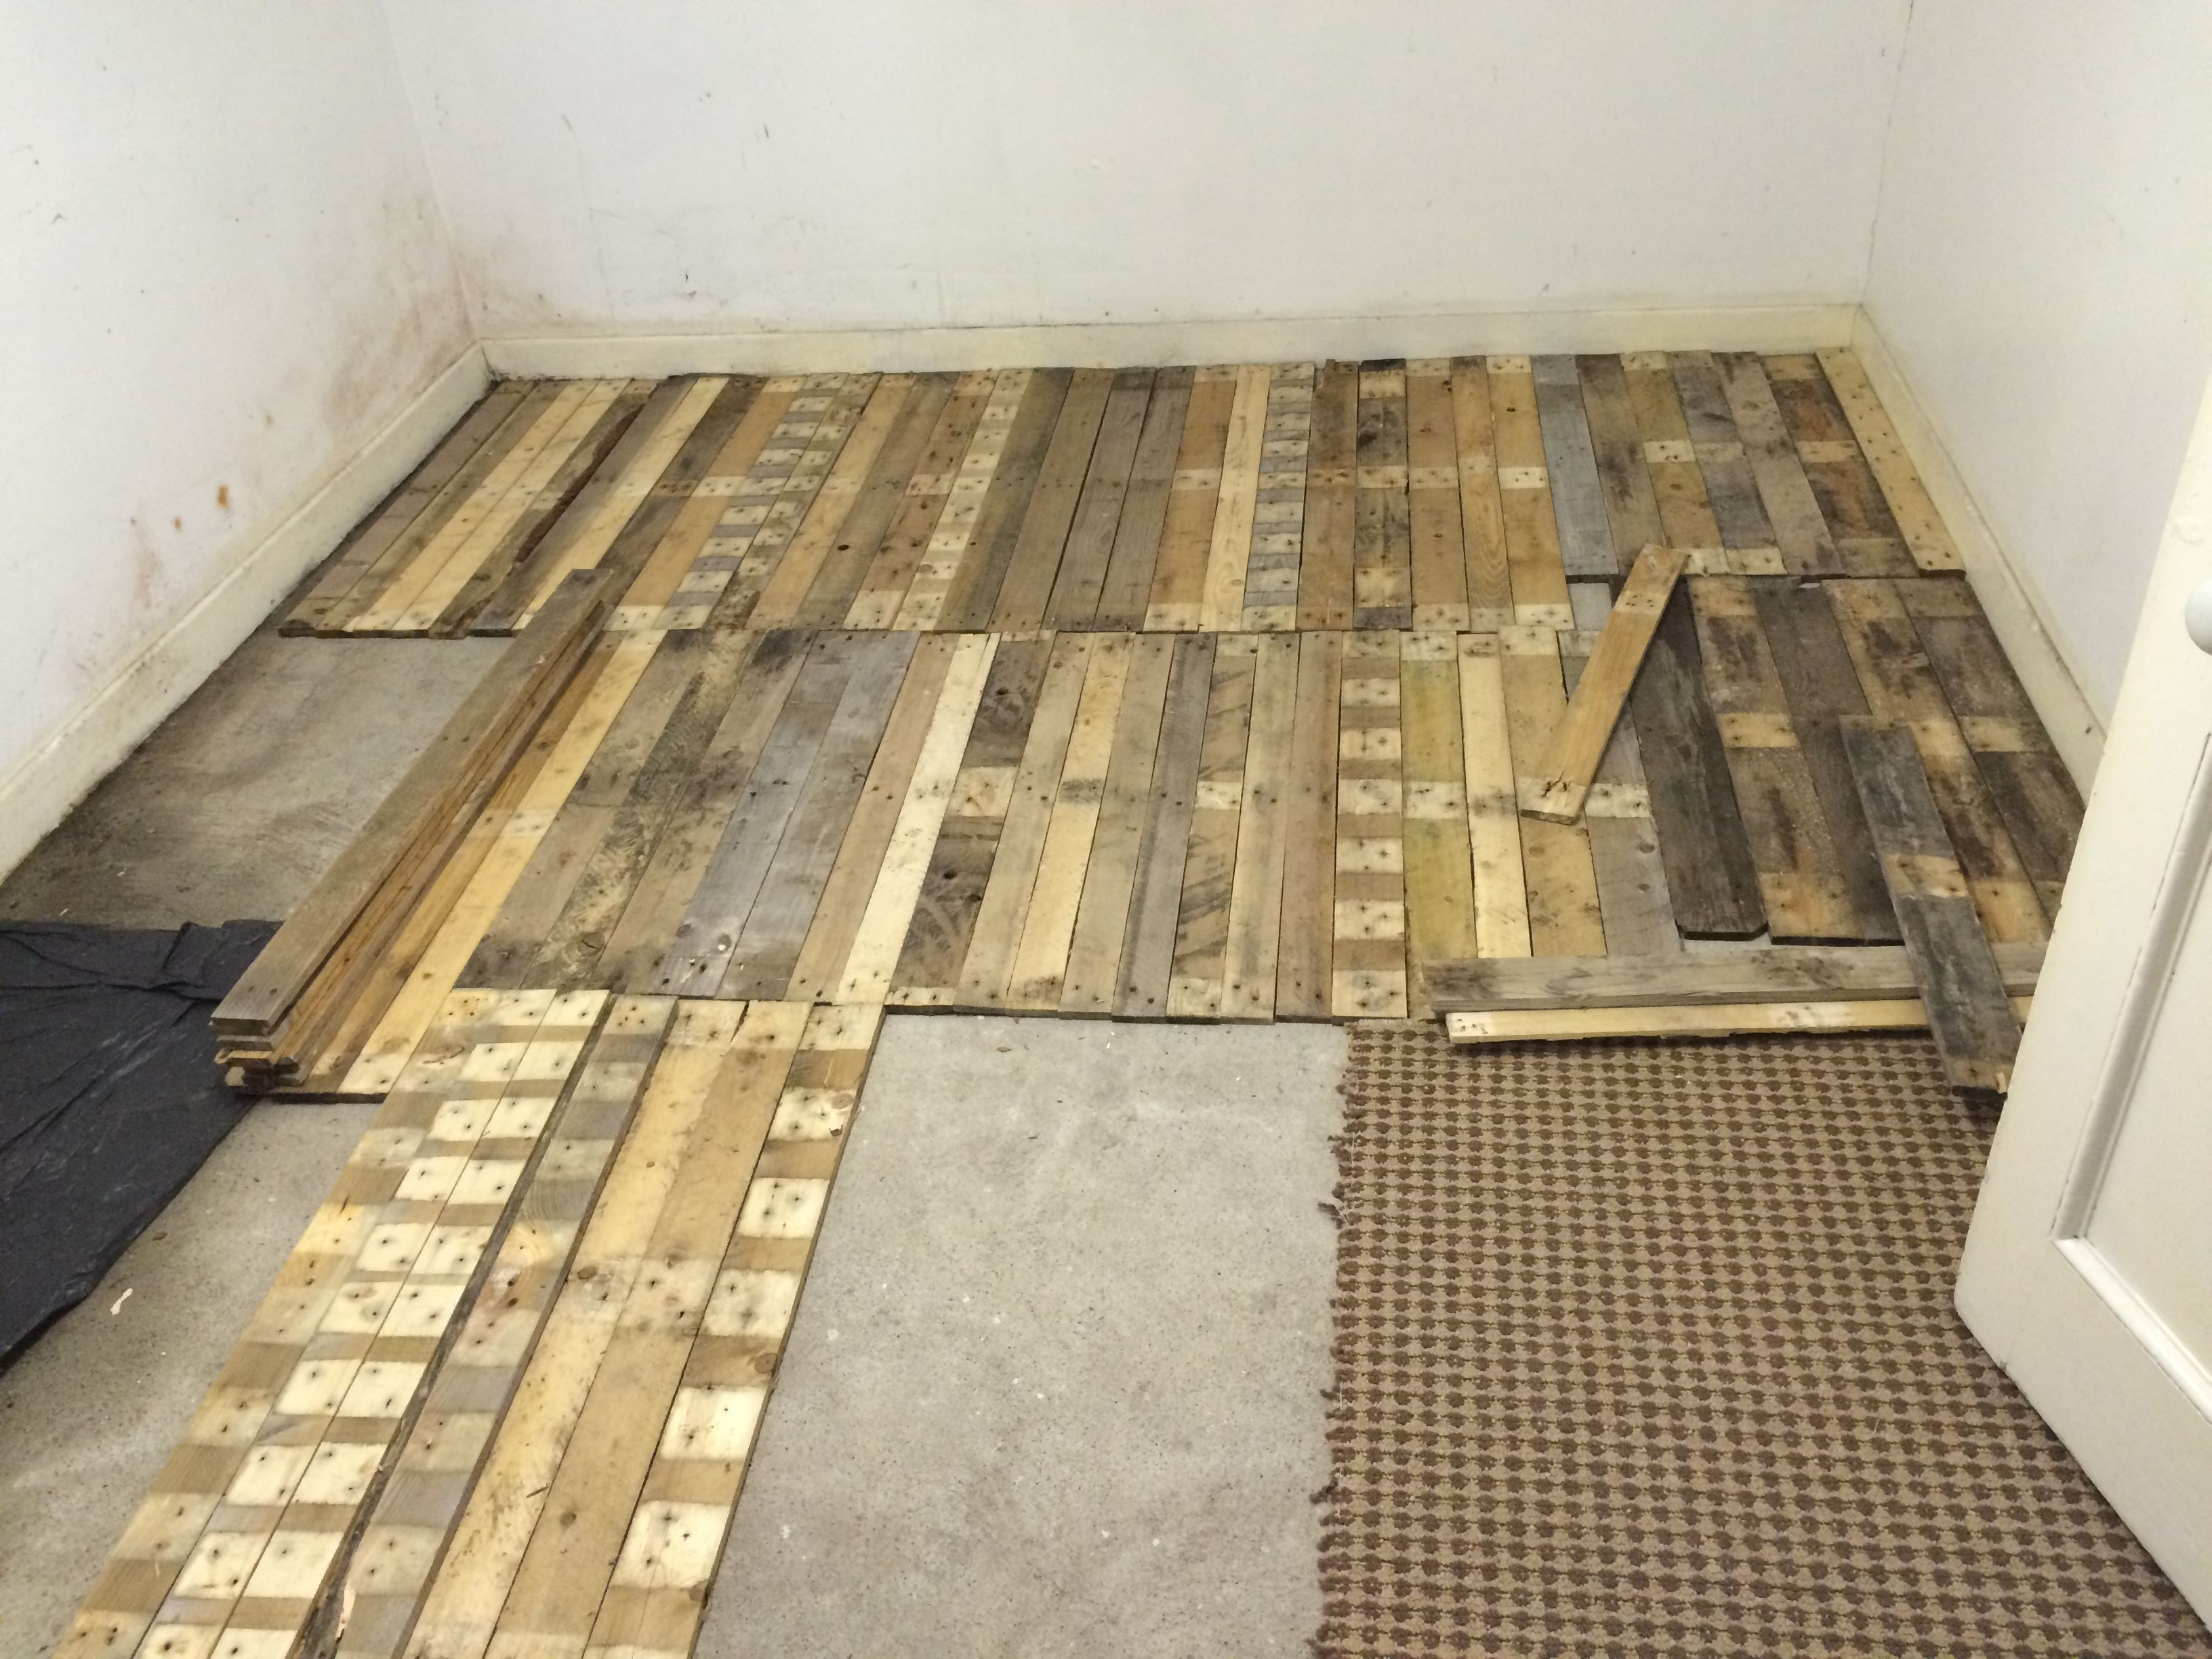 Removable Pallet Kitchen Floor 1001 Pallets Pallet Floors Flooring Pallet Kitchen